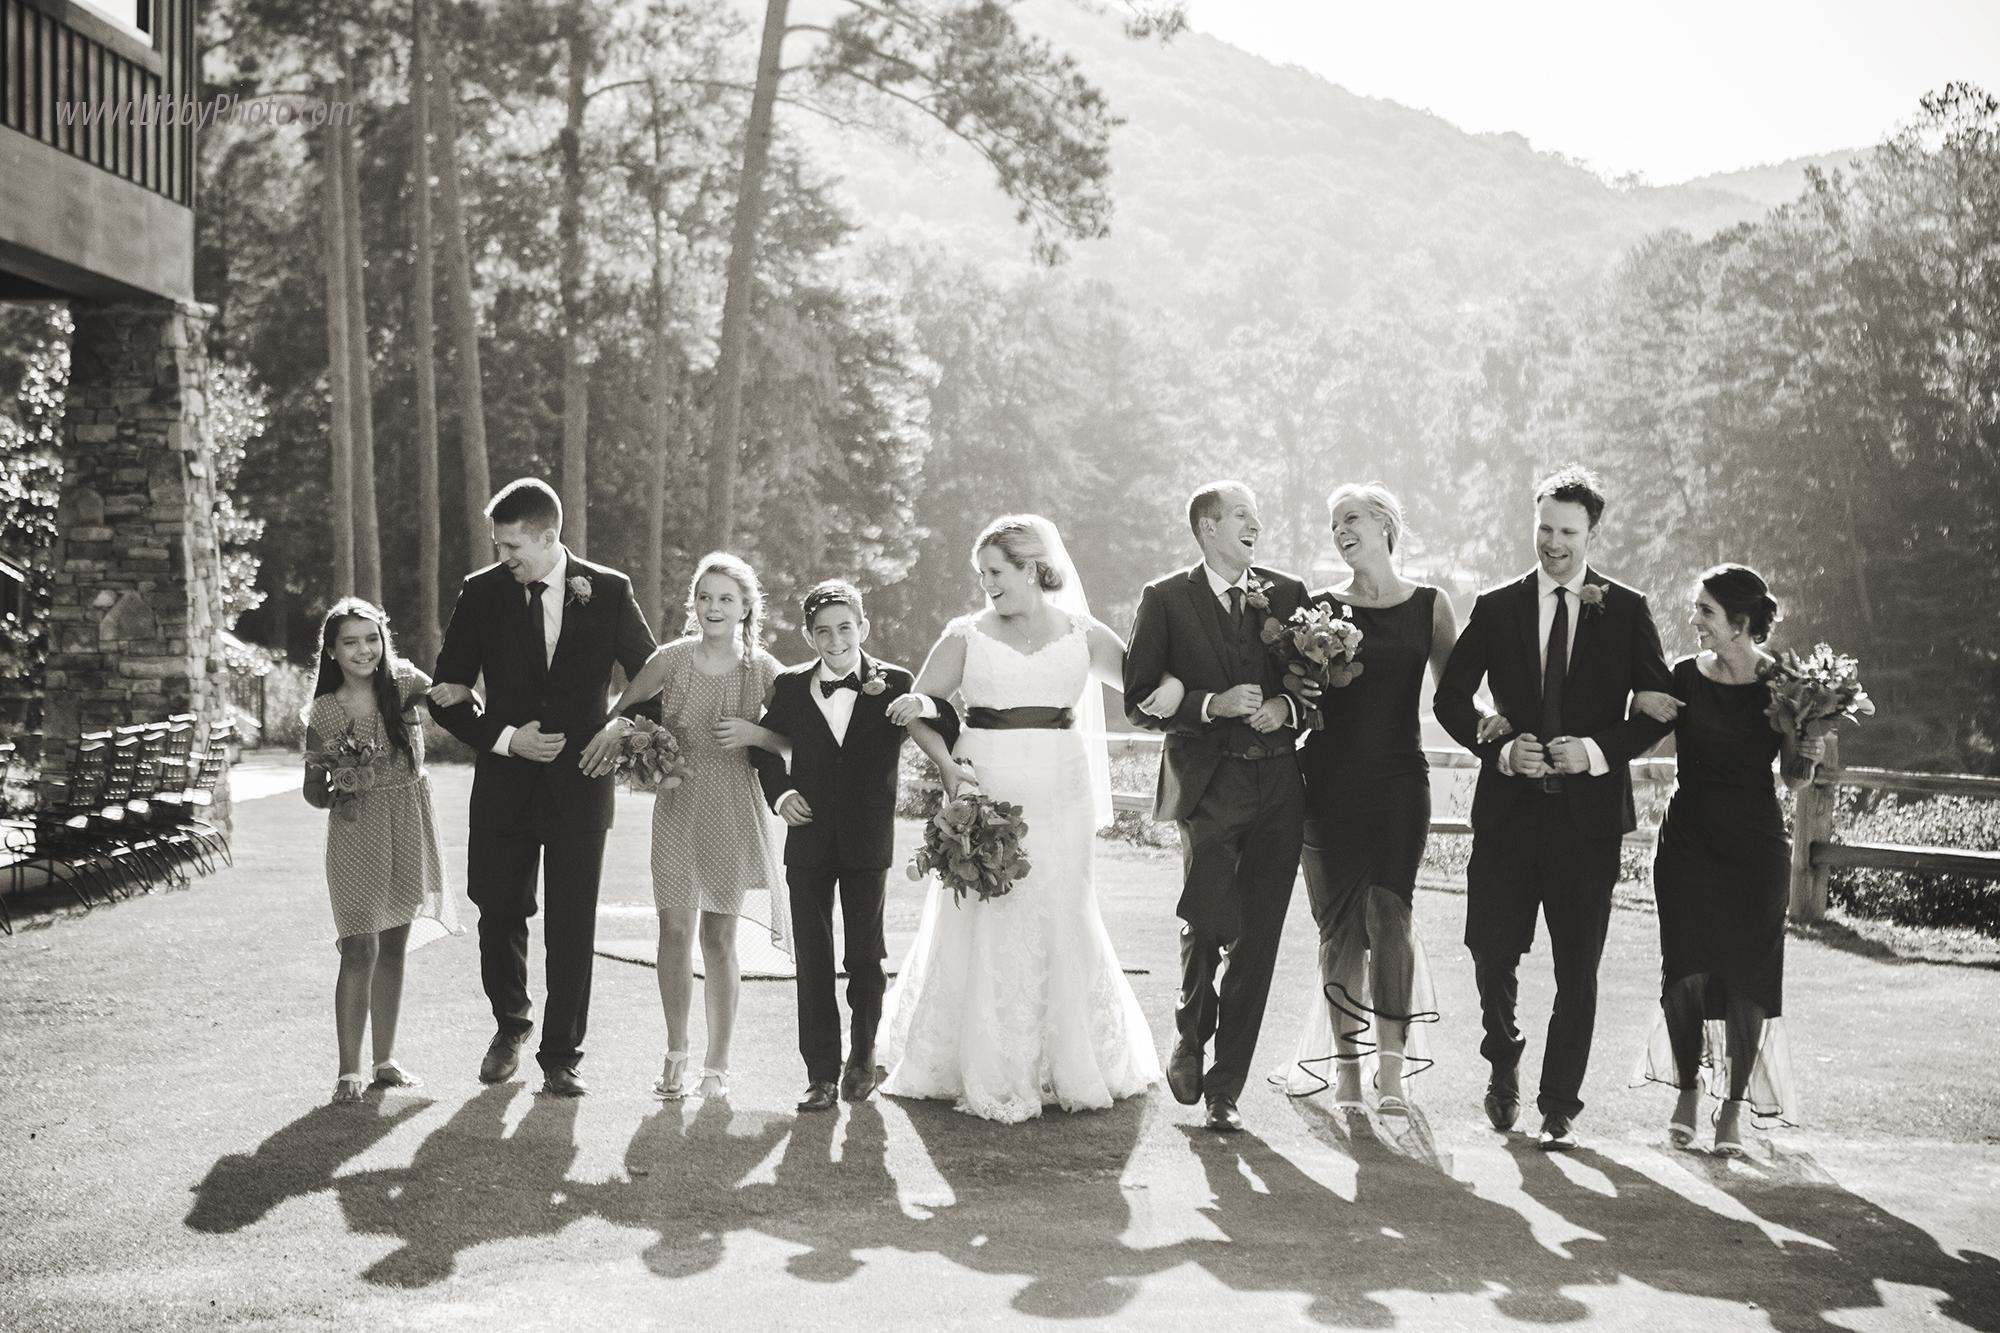 Atlanta wedding photography, Libbyphoto11 (14).jpg